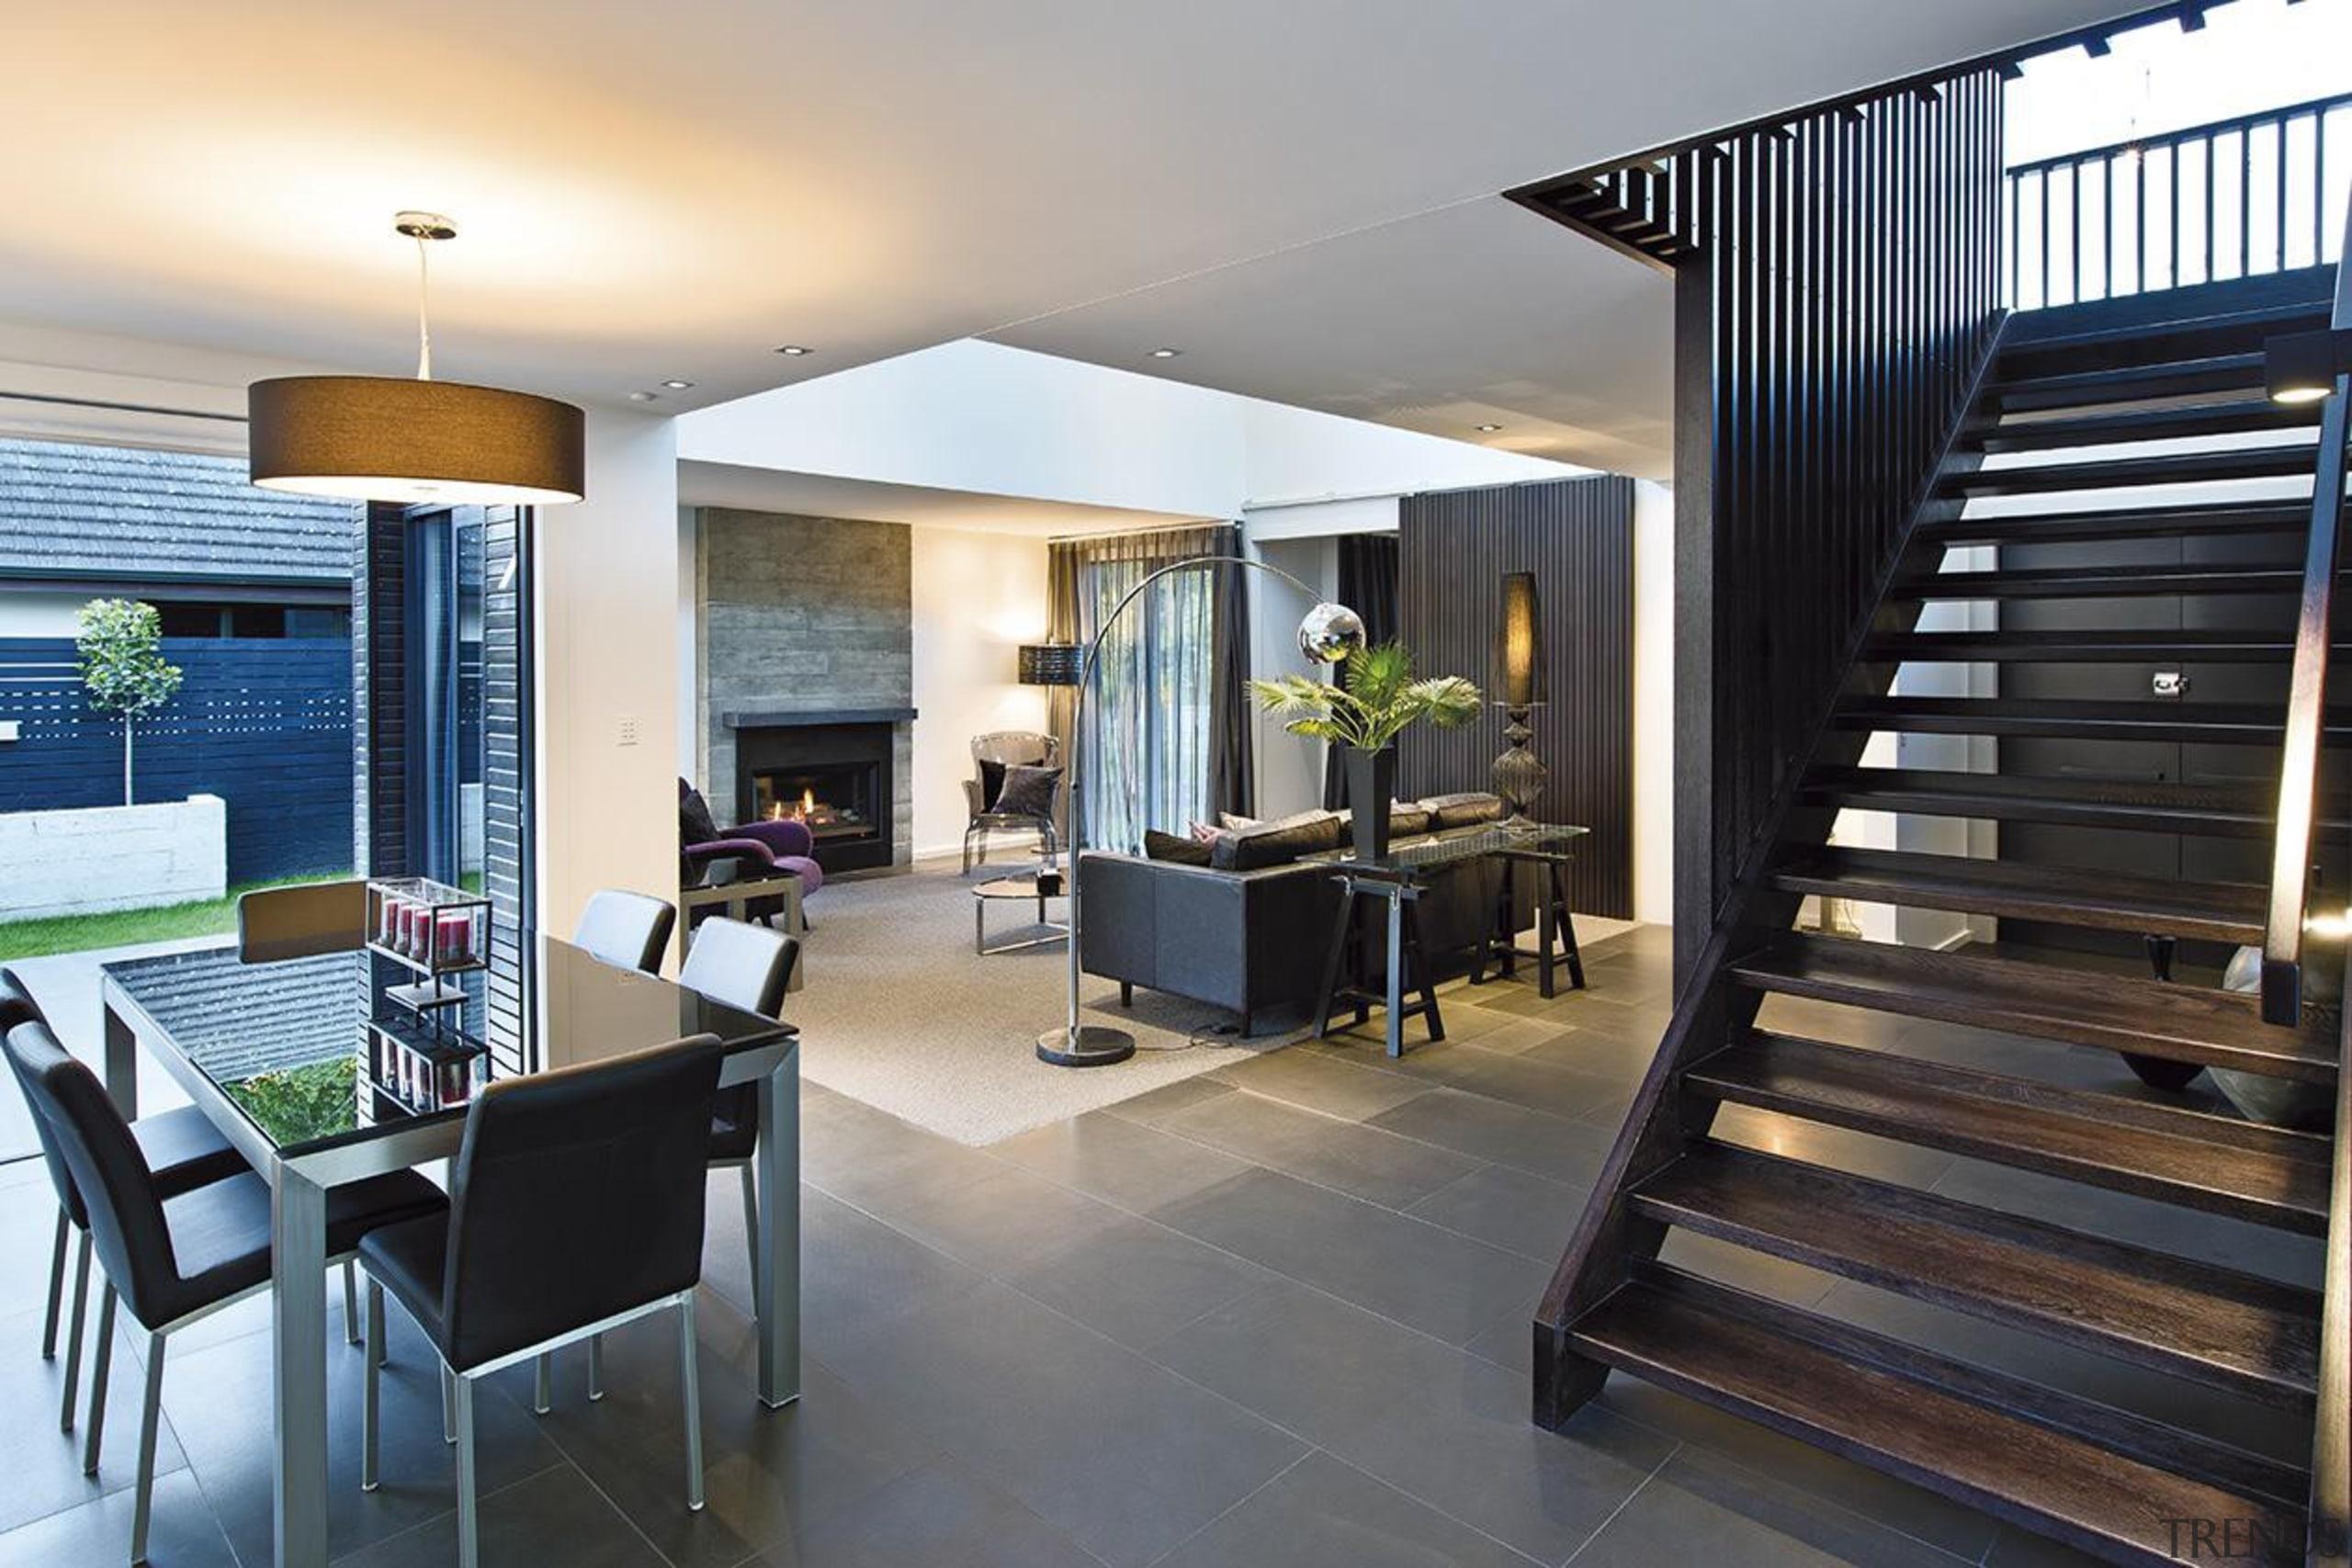 For more information, please visit www.gjgardner.co.nz apartment, flooring, house, interior design, living room, property, real estate, black, gray, white